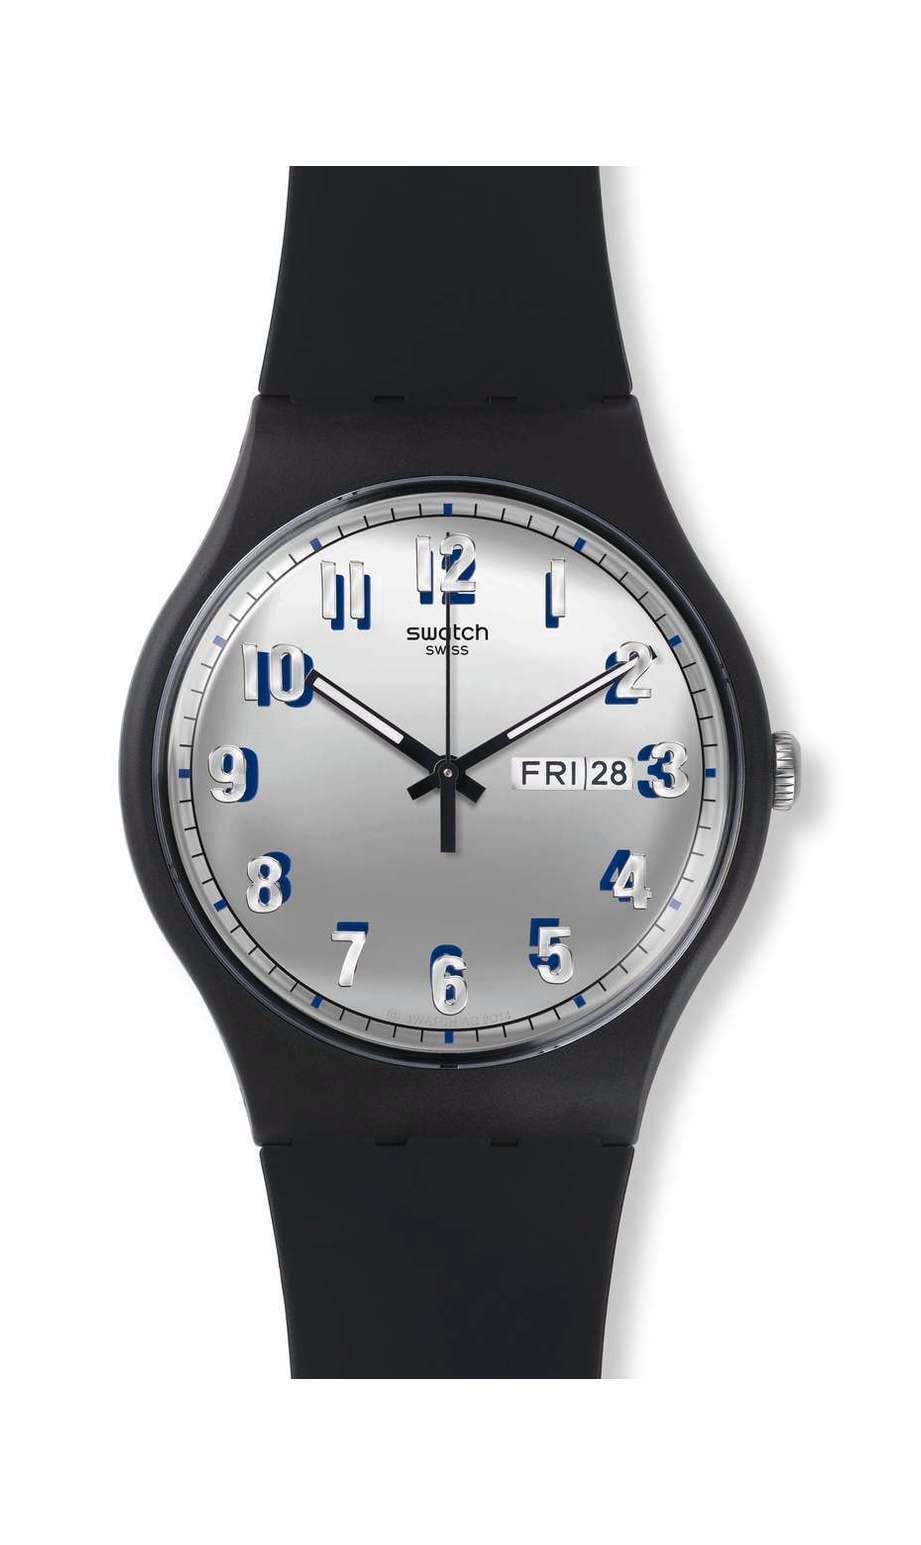 Swatch - SECRET SERVICE - 1